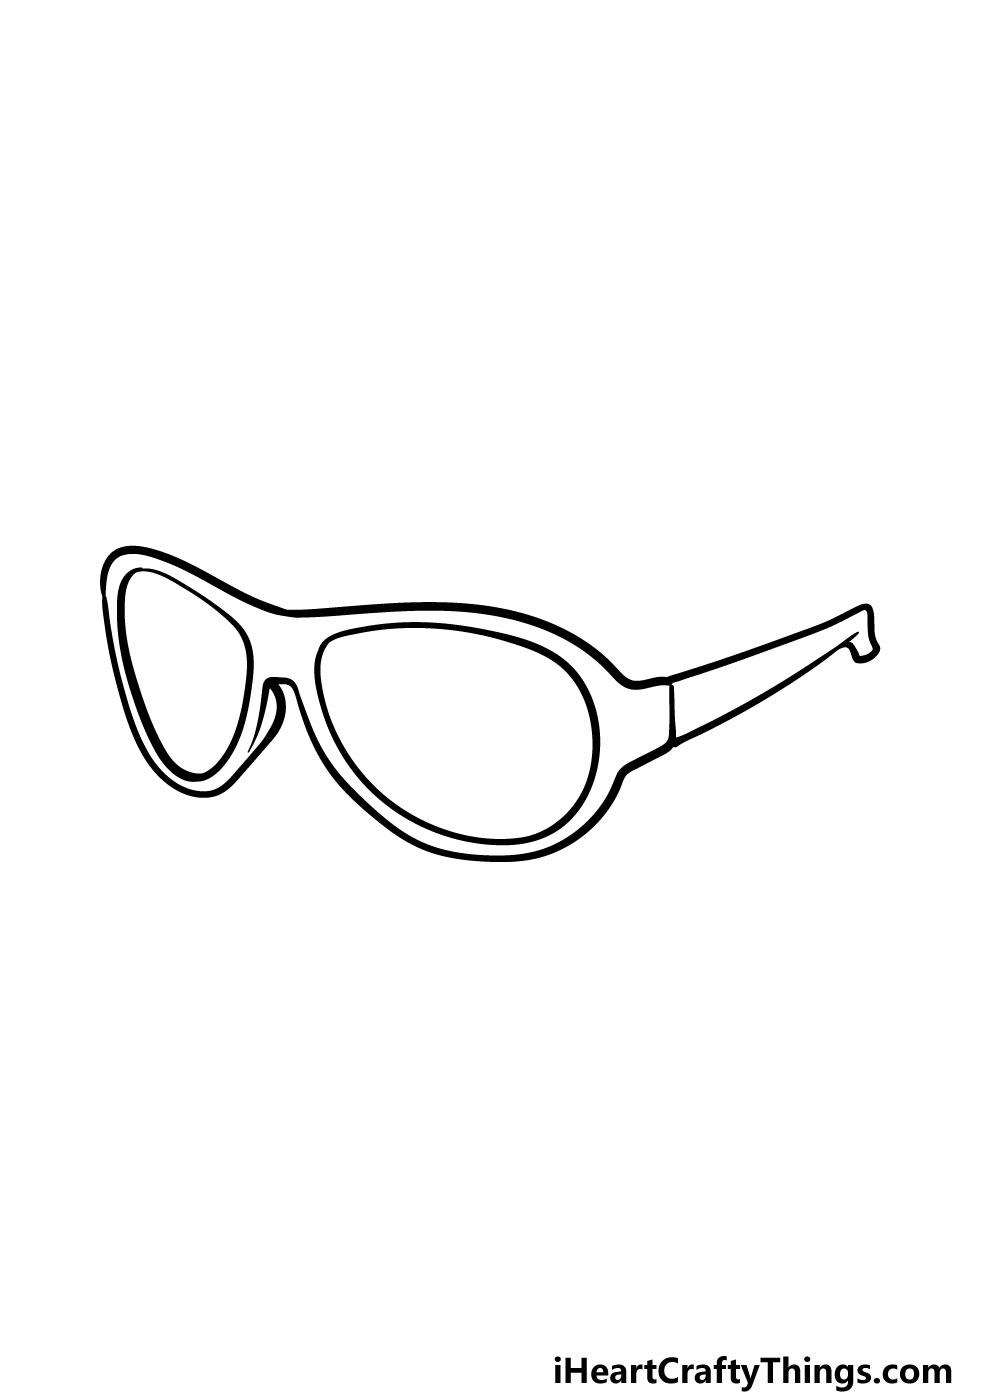 drawing sunglasses step 4